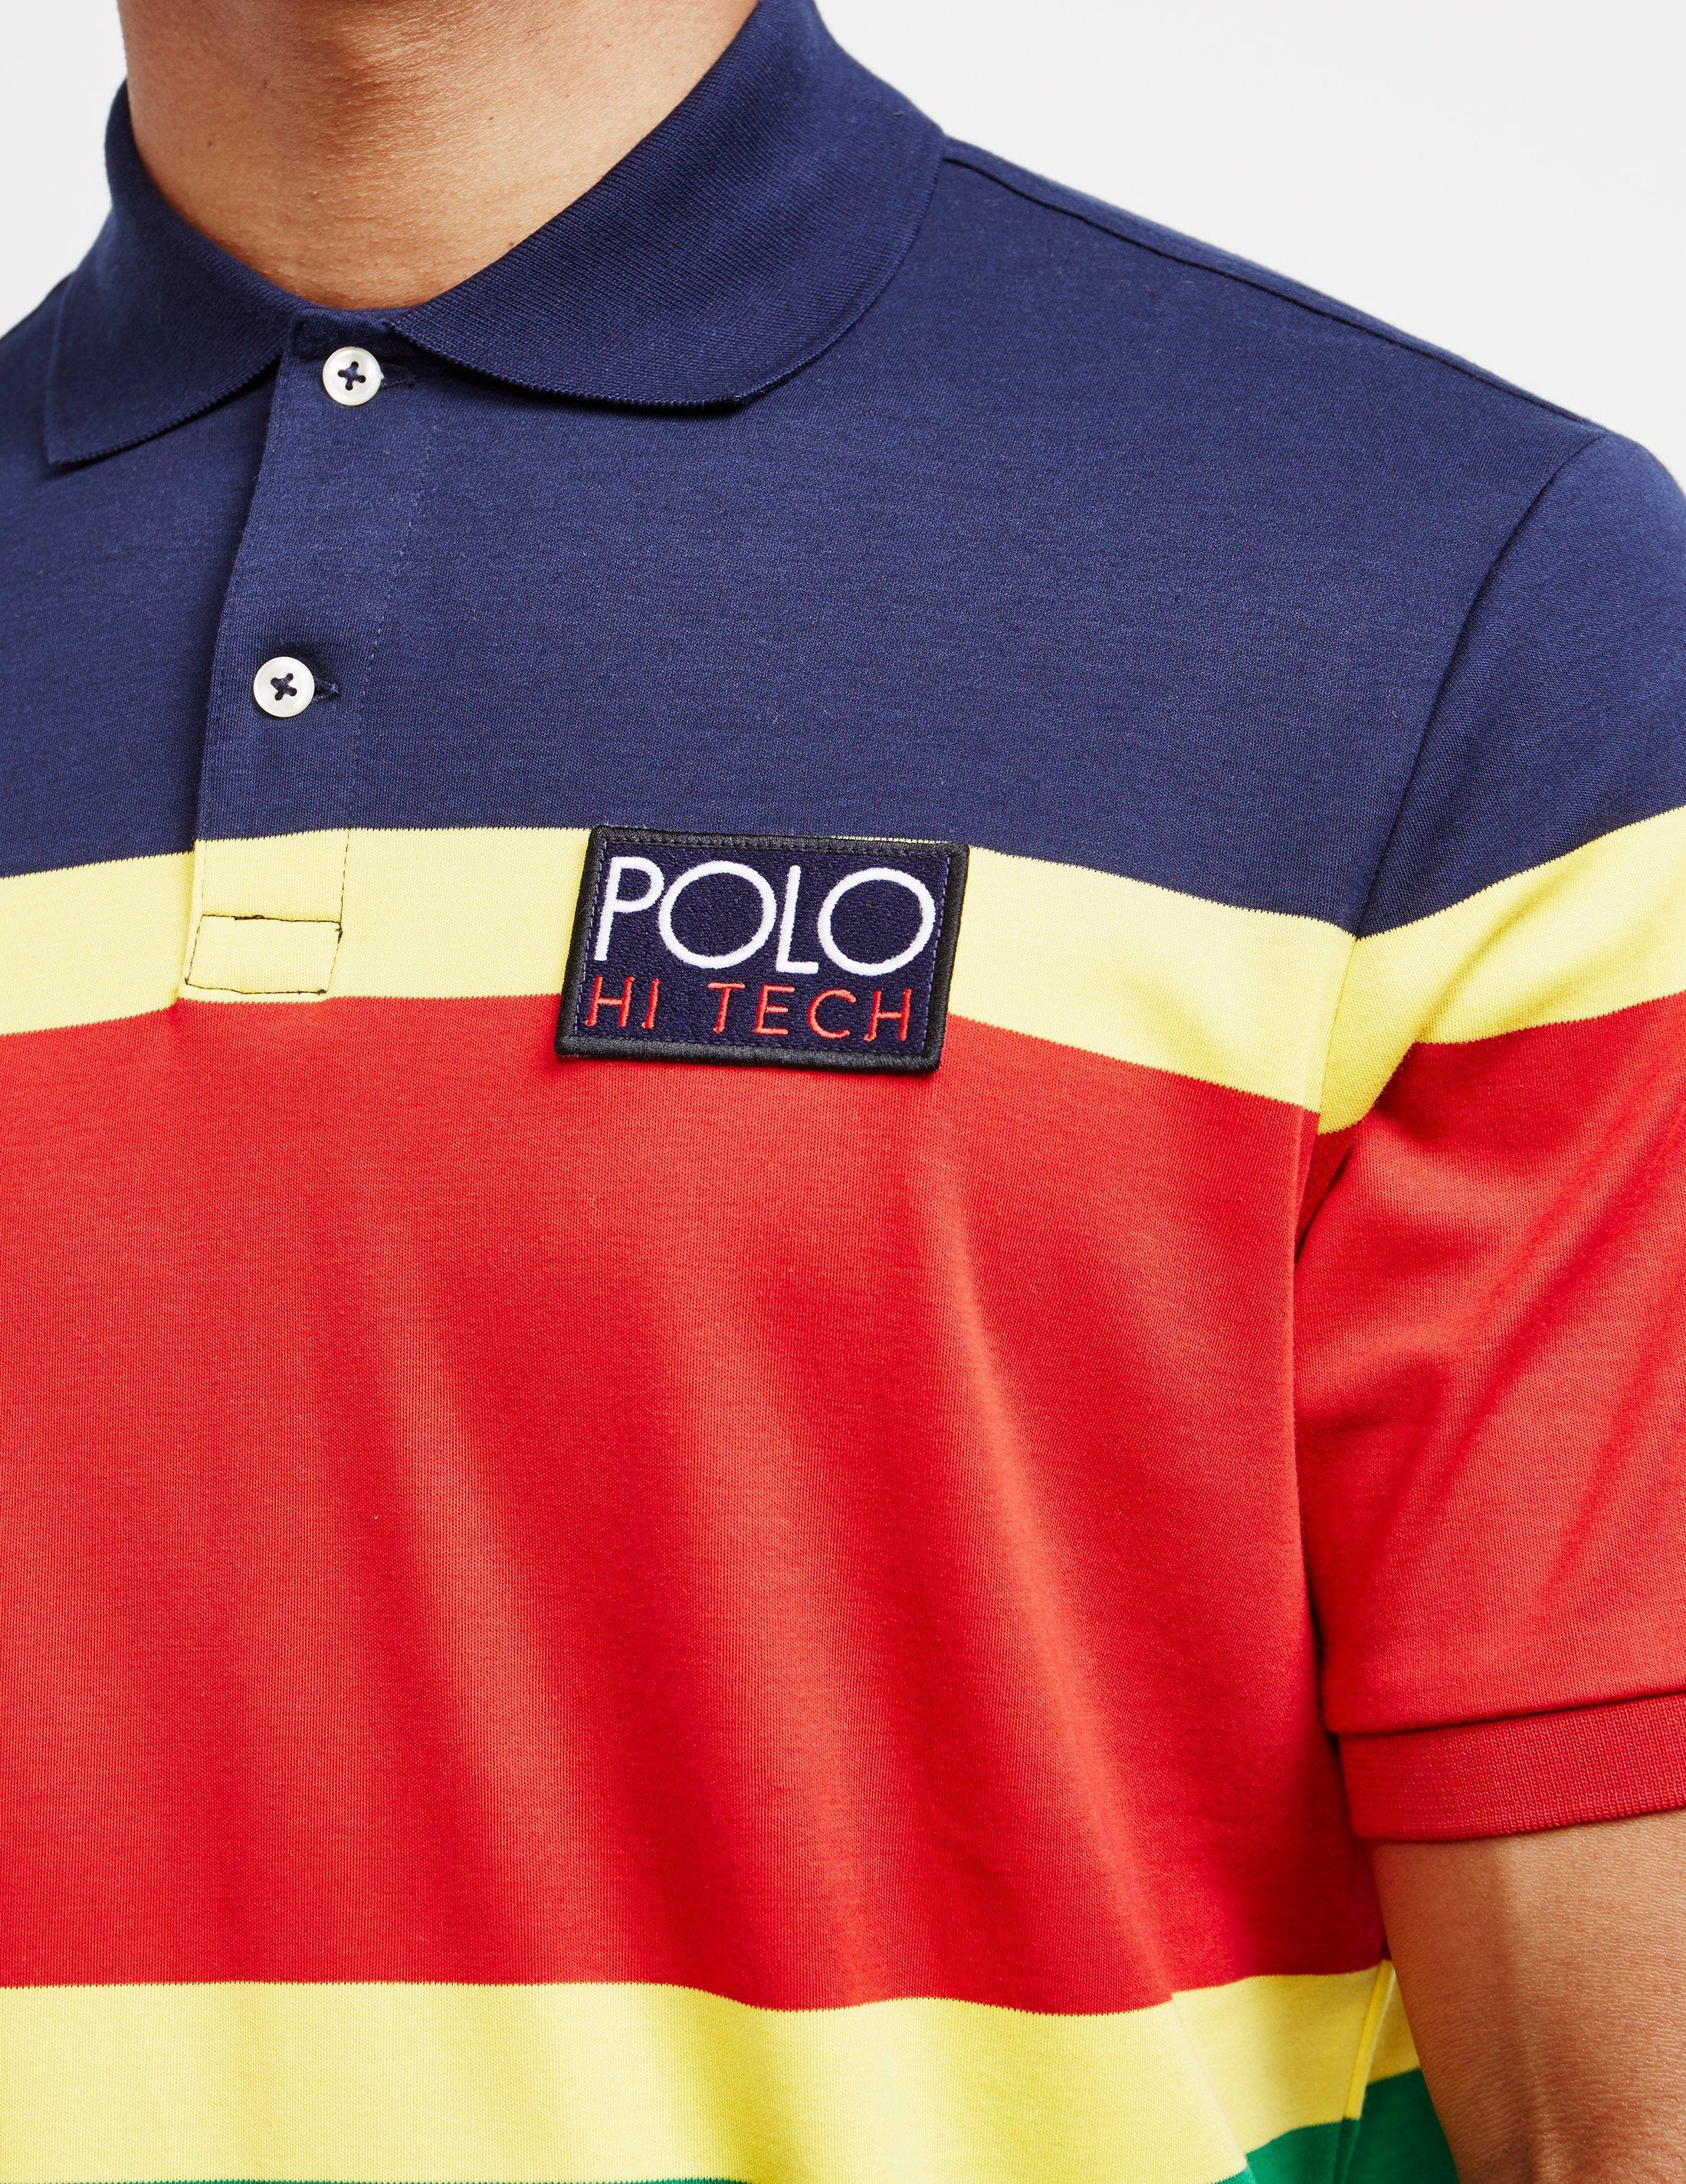 6bf9f7b1103 Polo Ralph Lauren - Hi Tech Short Sleeve Polo Shirt Red for Men - Lyst.  View fullscreen